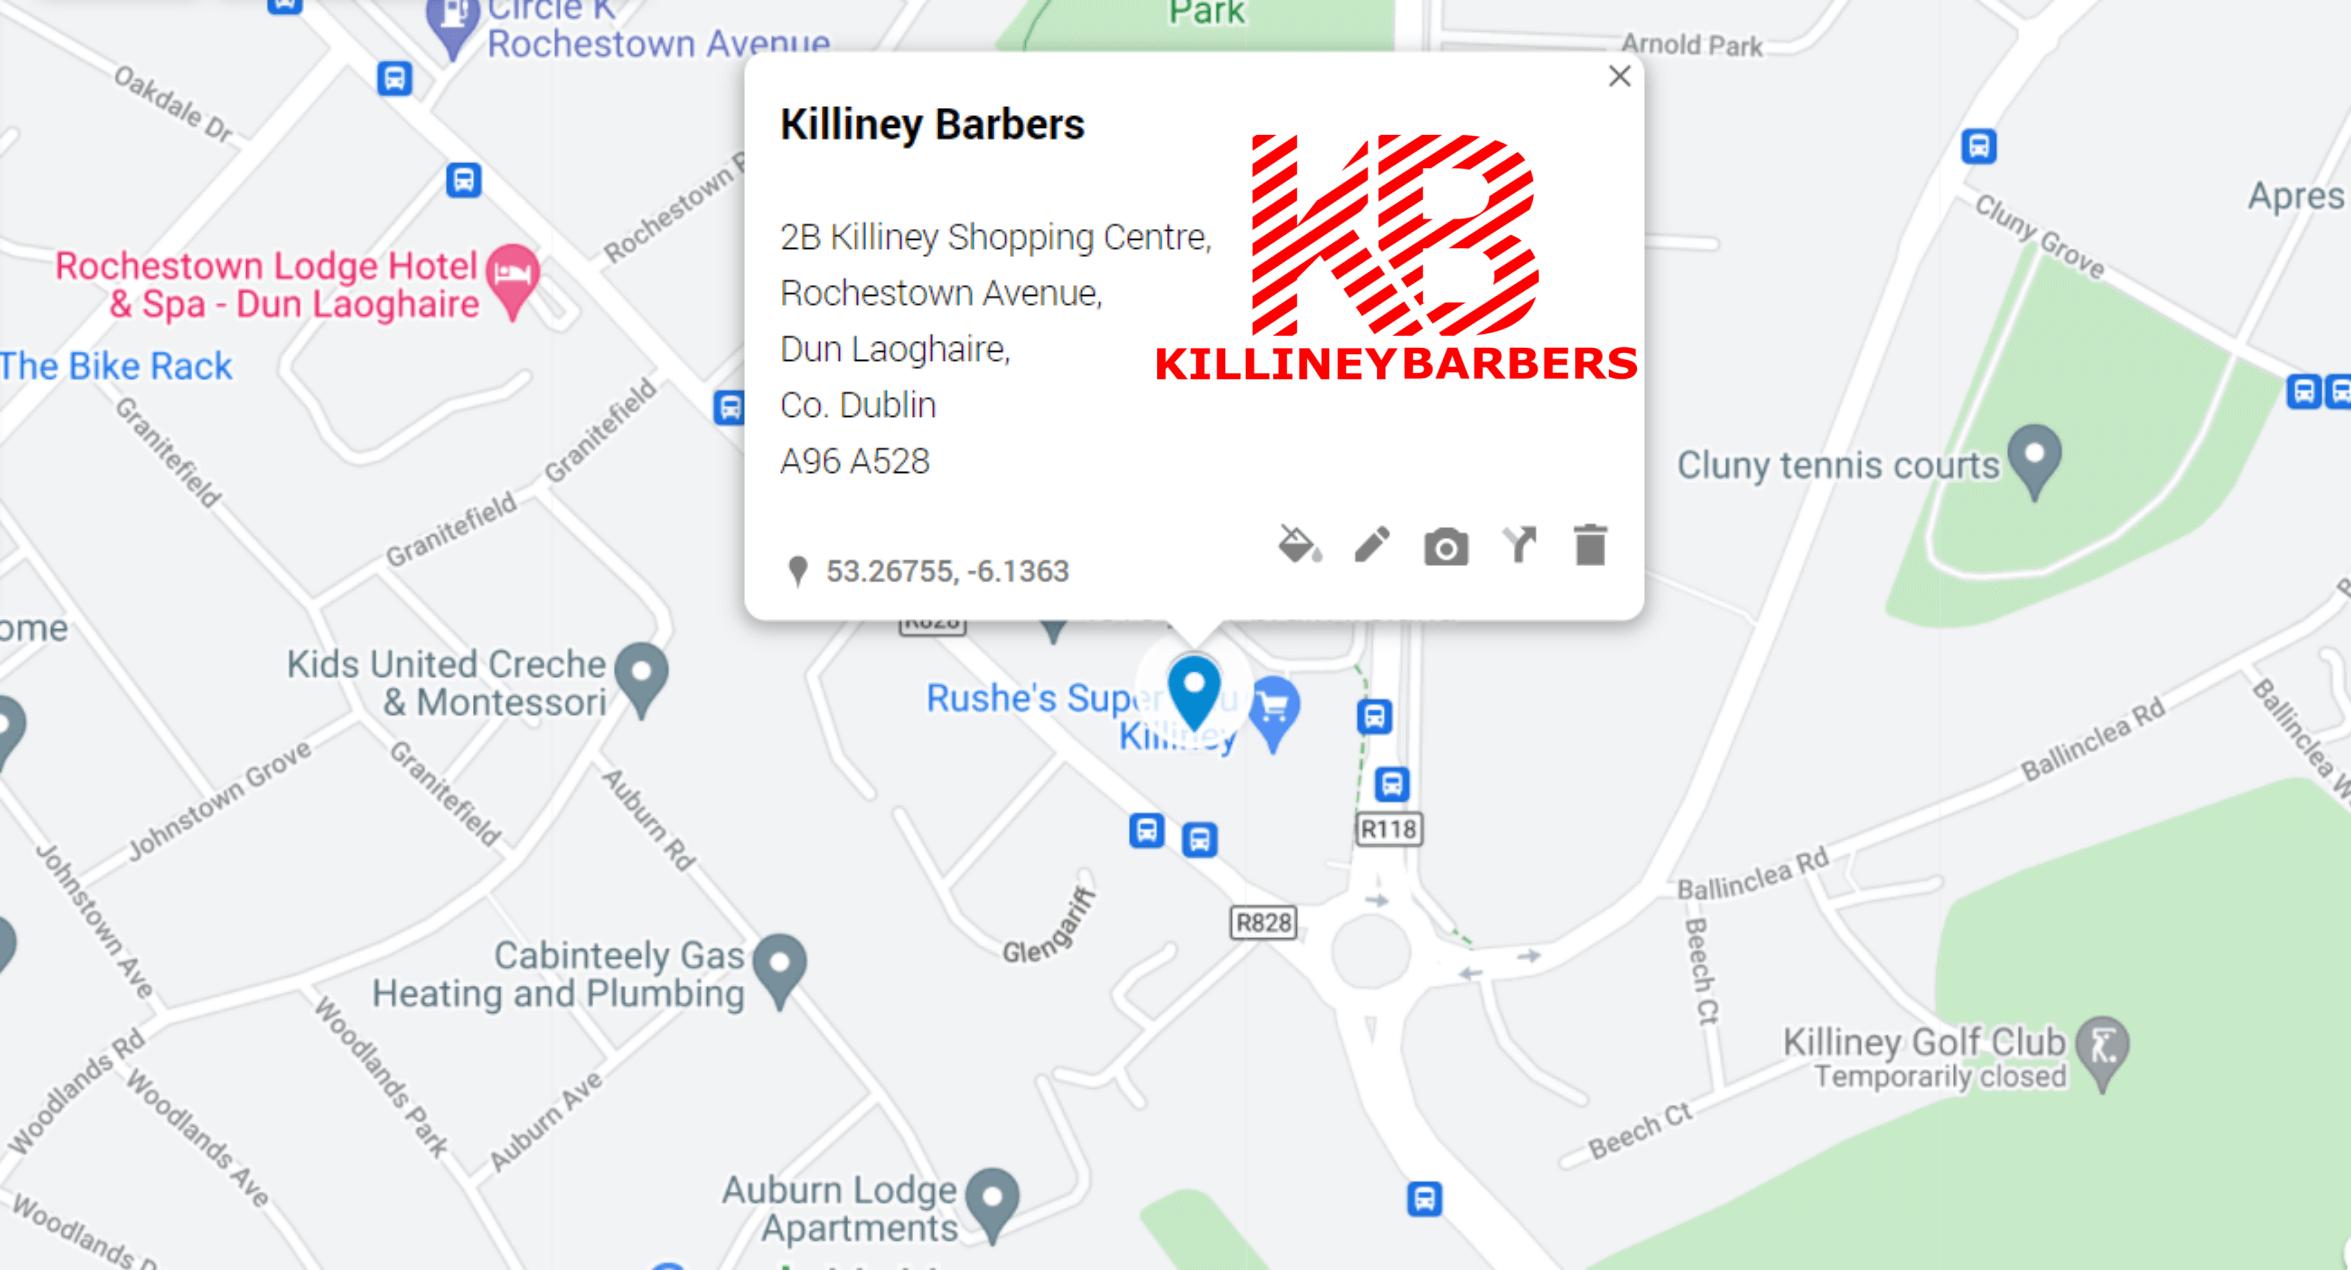 Killiney Barbers Directions